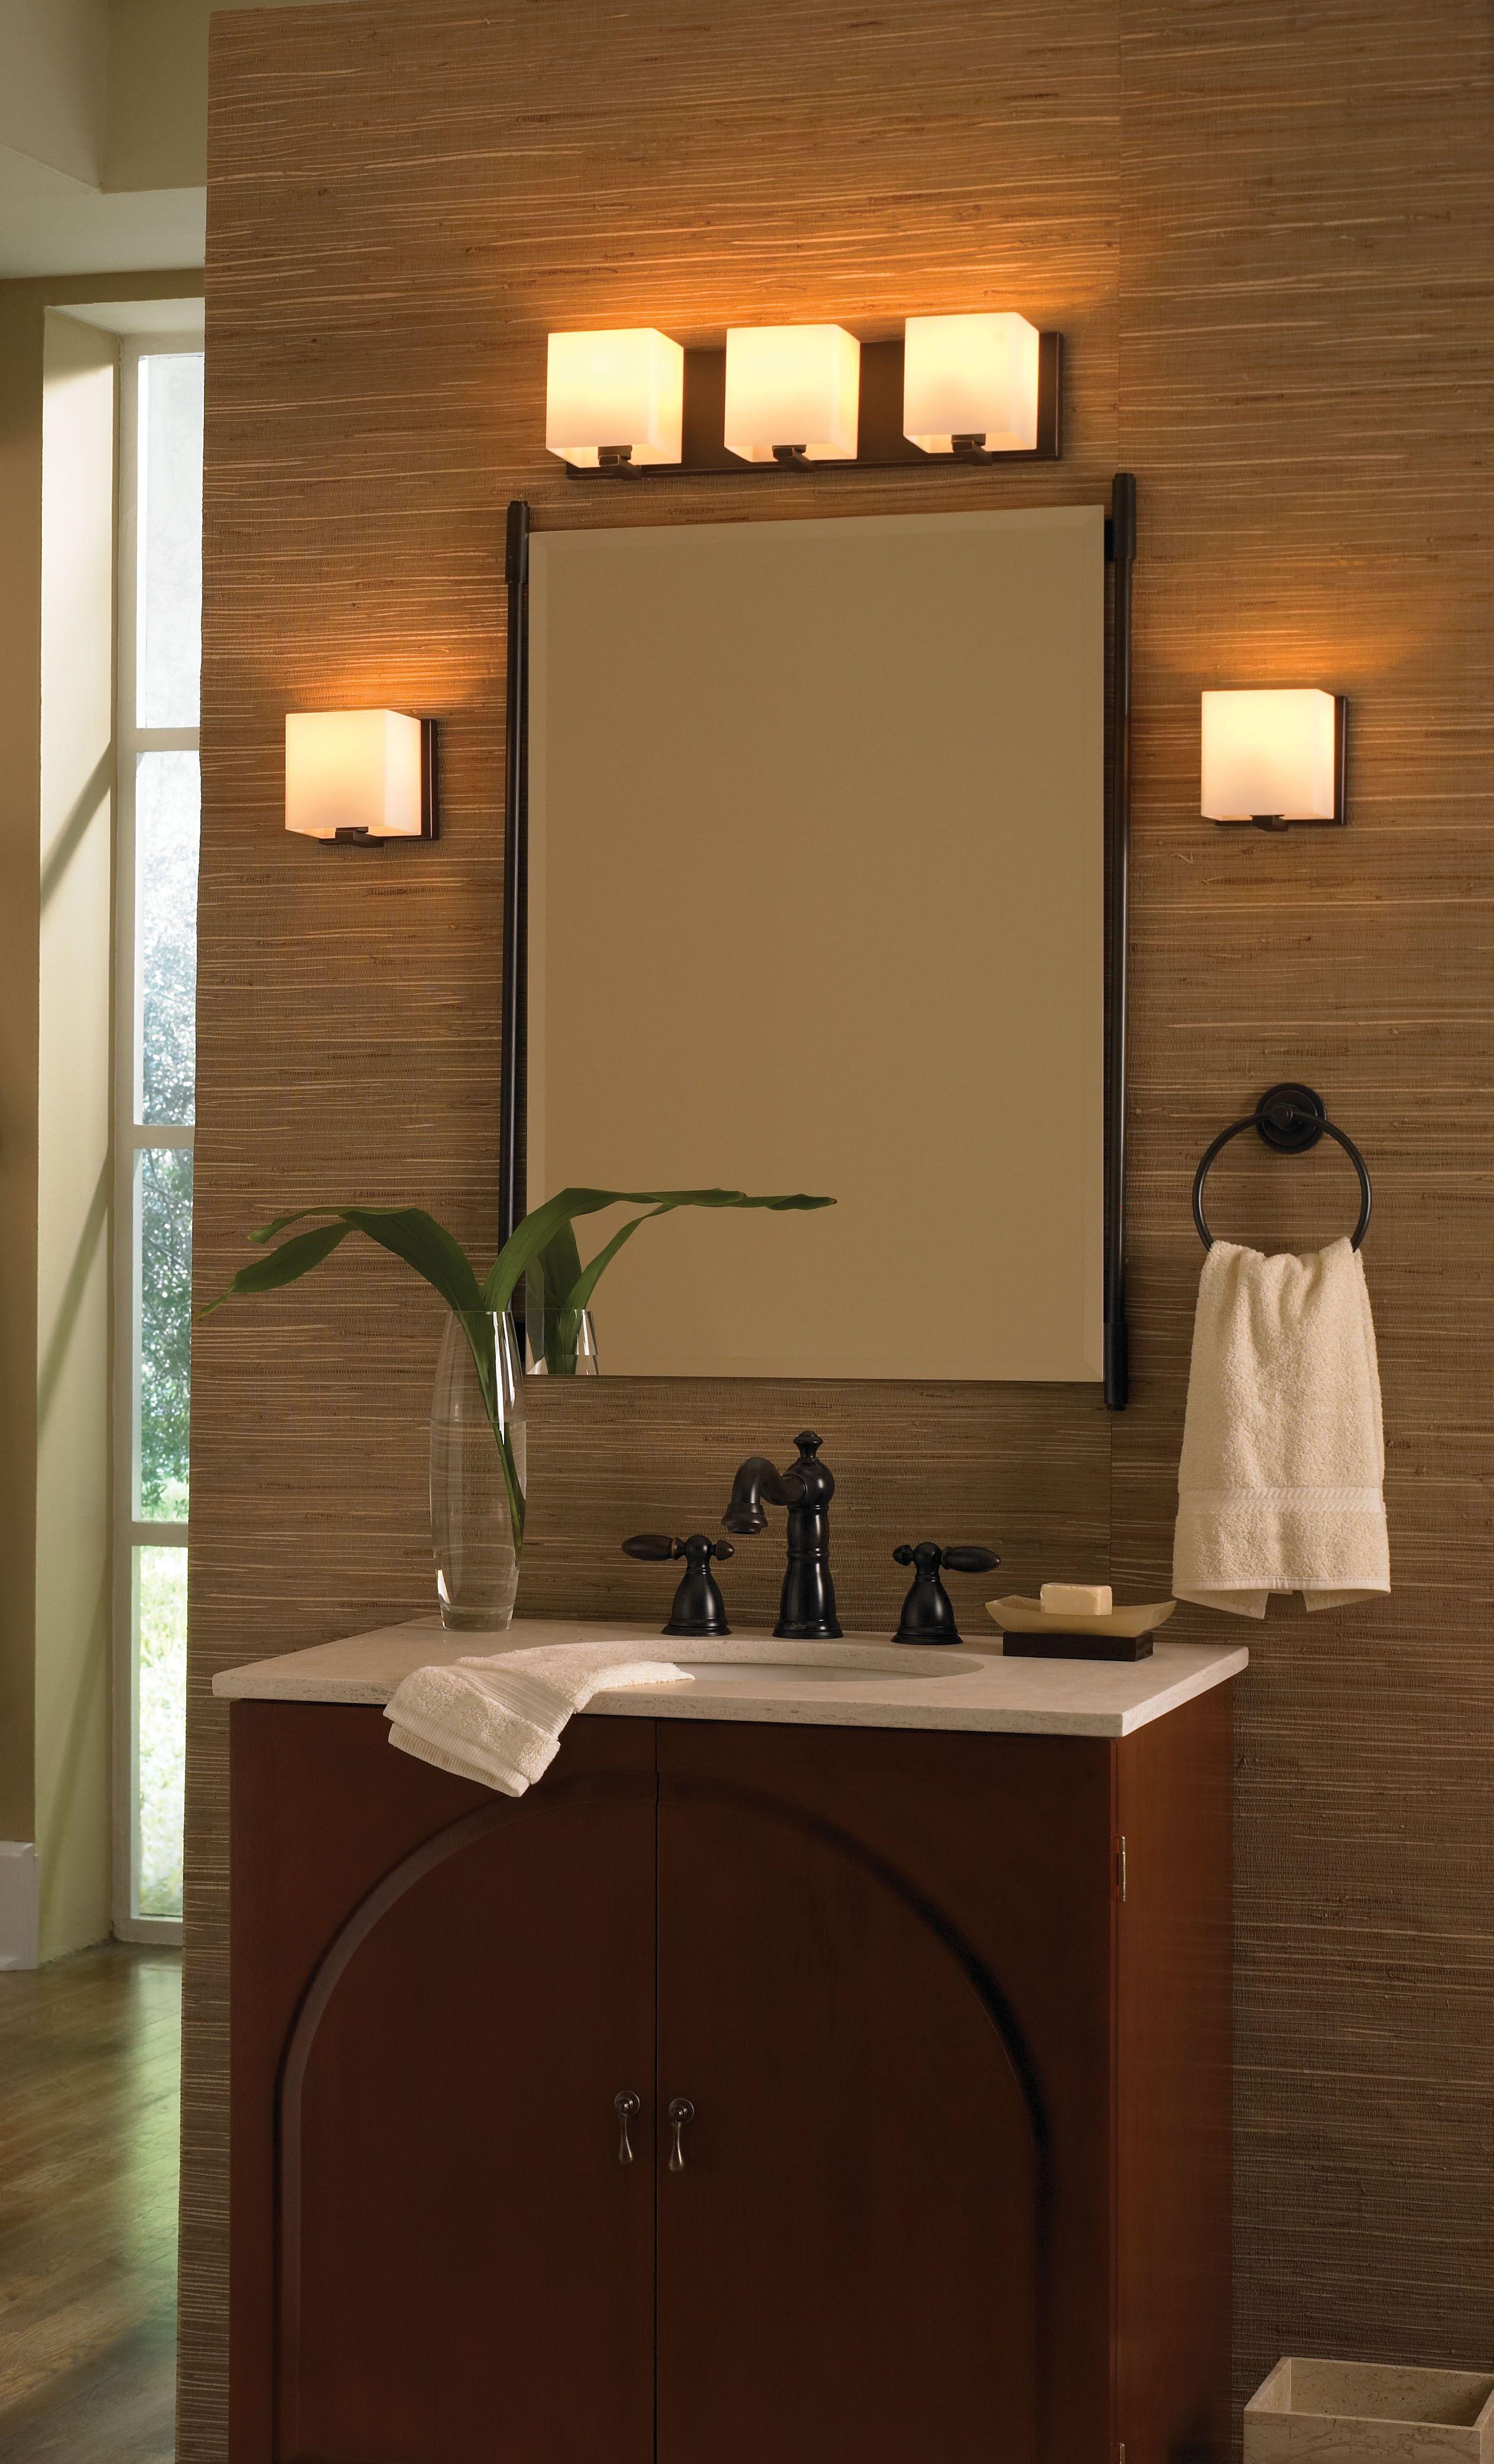 Best Bathroom Light Bulbs For Makeup